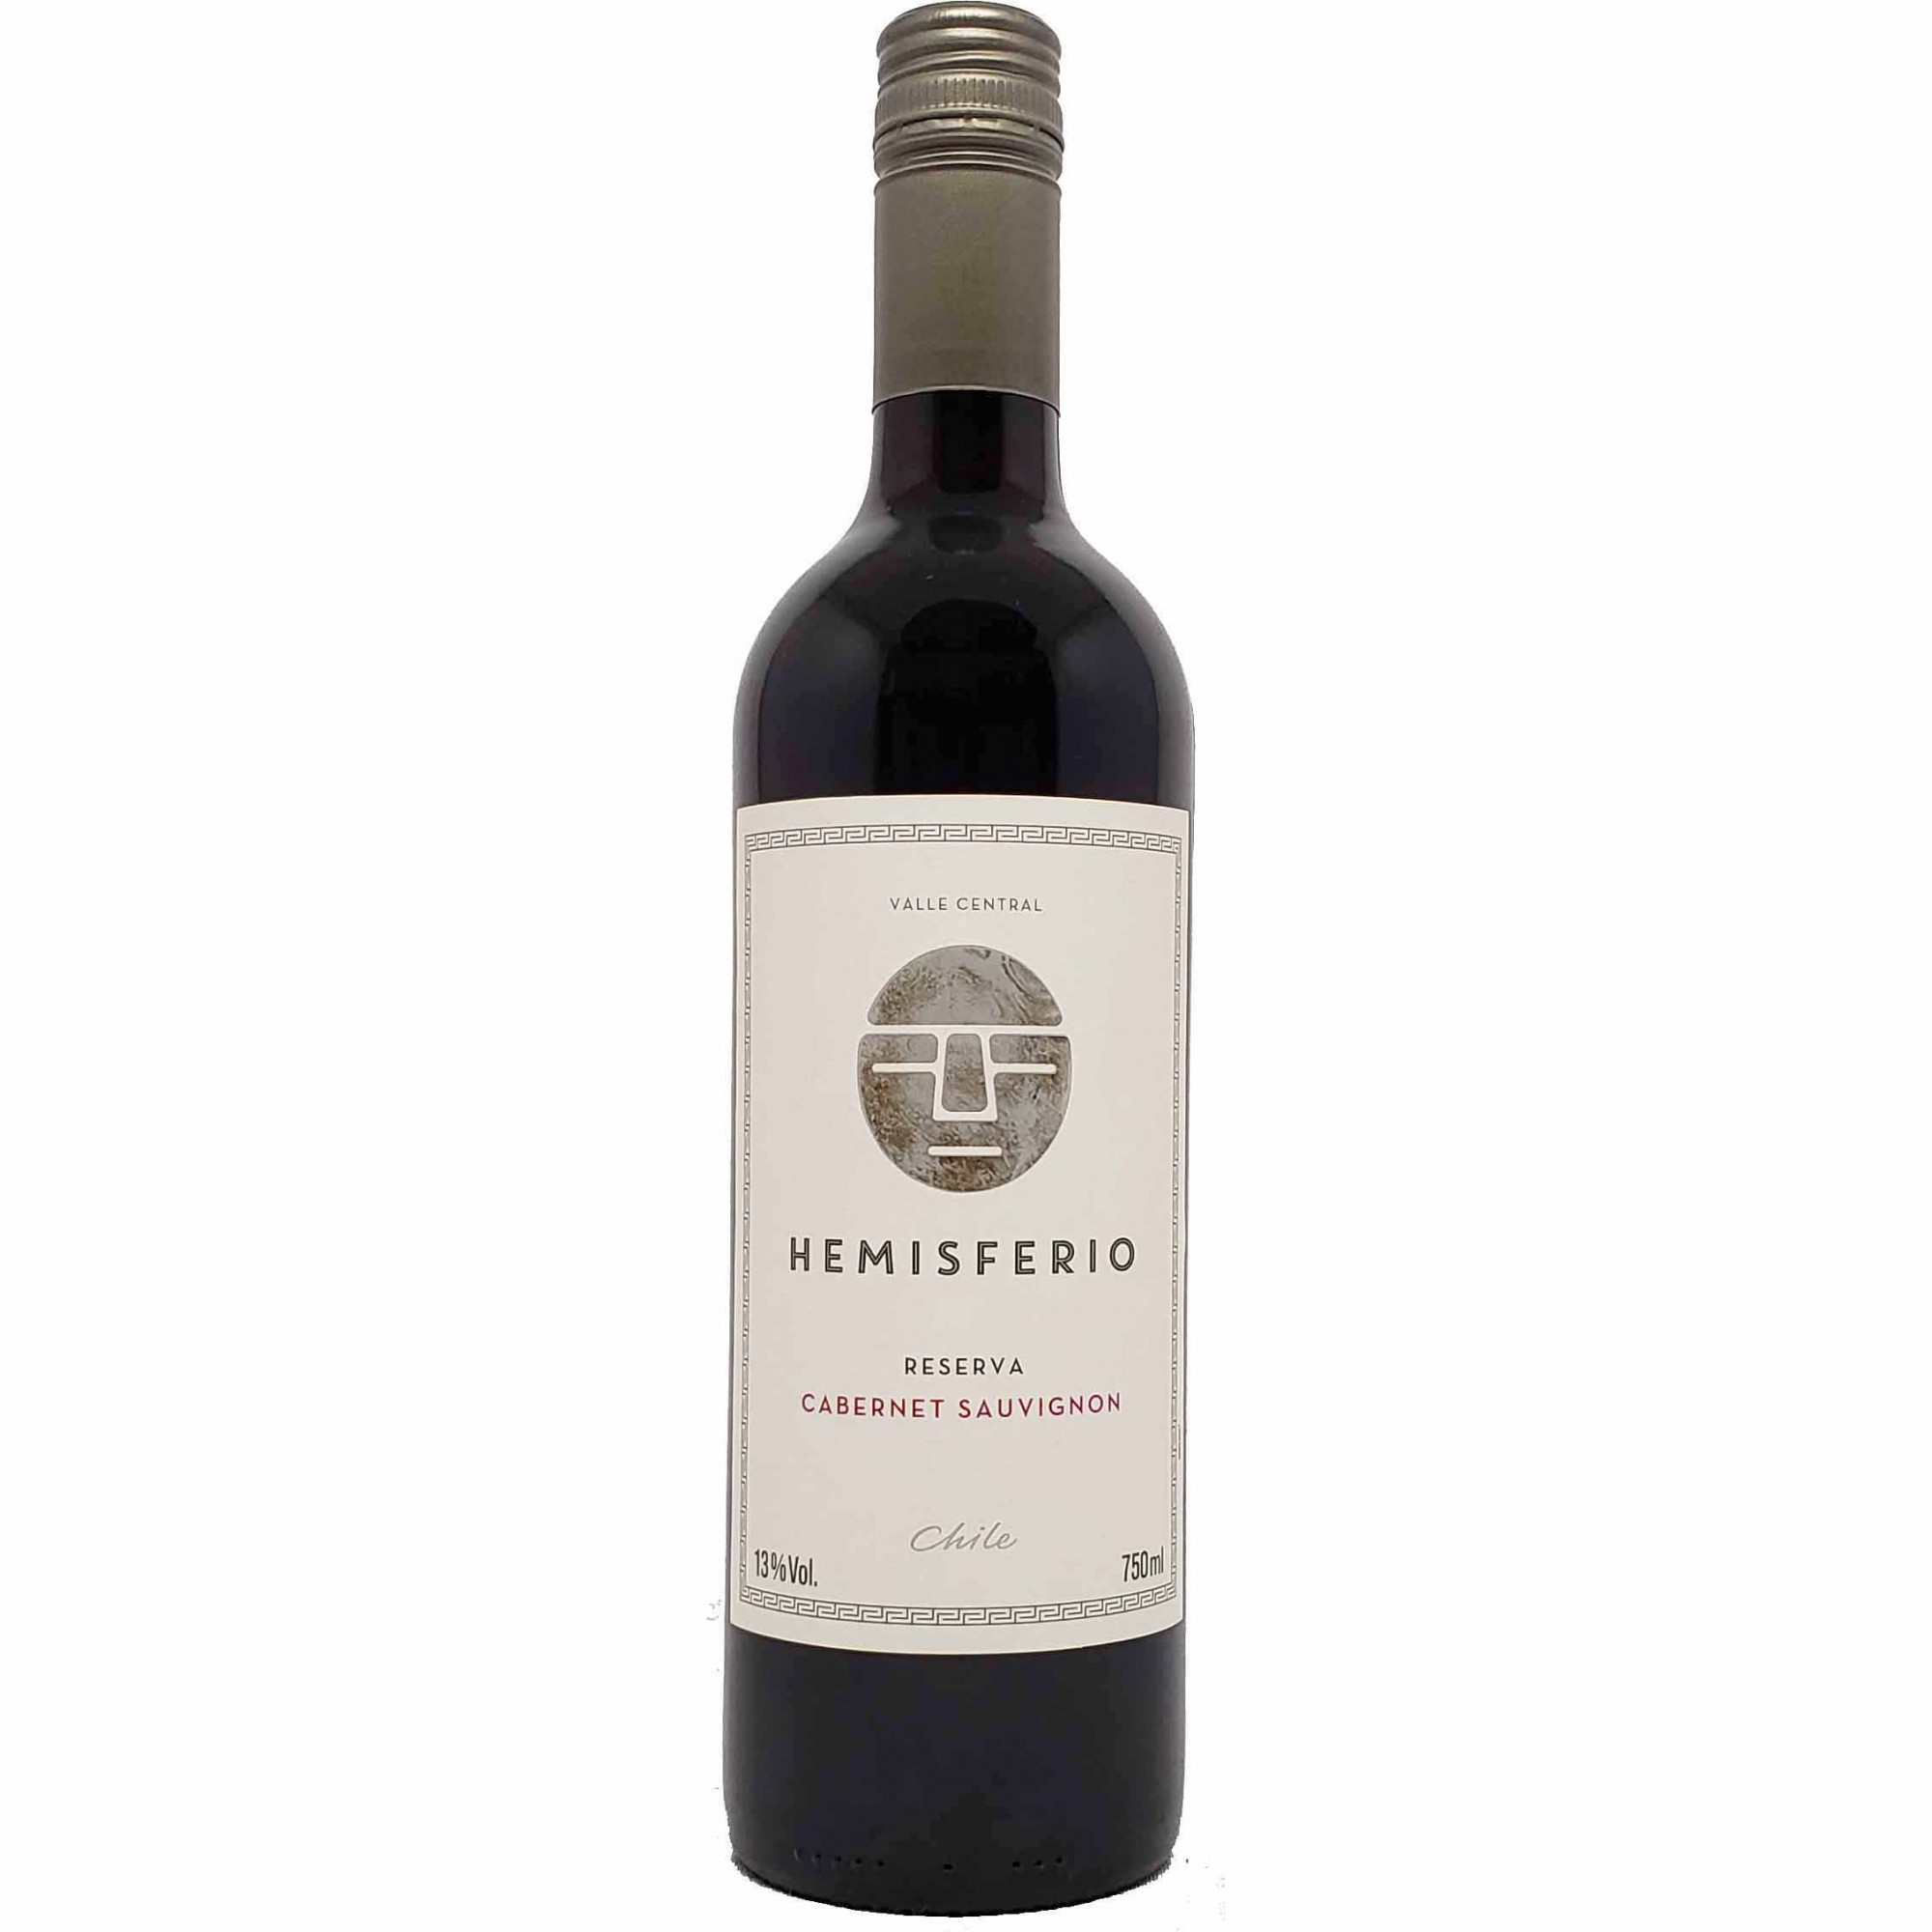 Vinho Tinto Hemisferio Reserva Cabernet Sauvignon - 750ml -